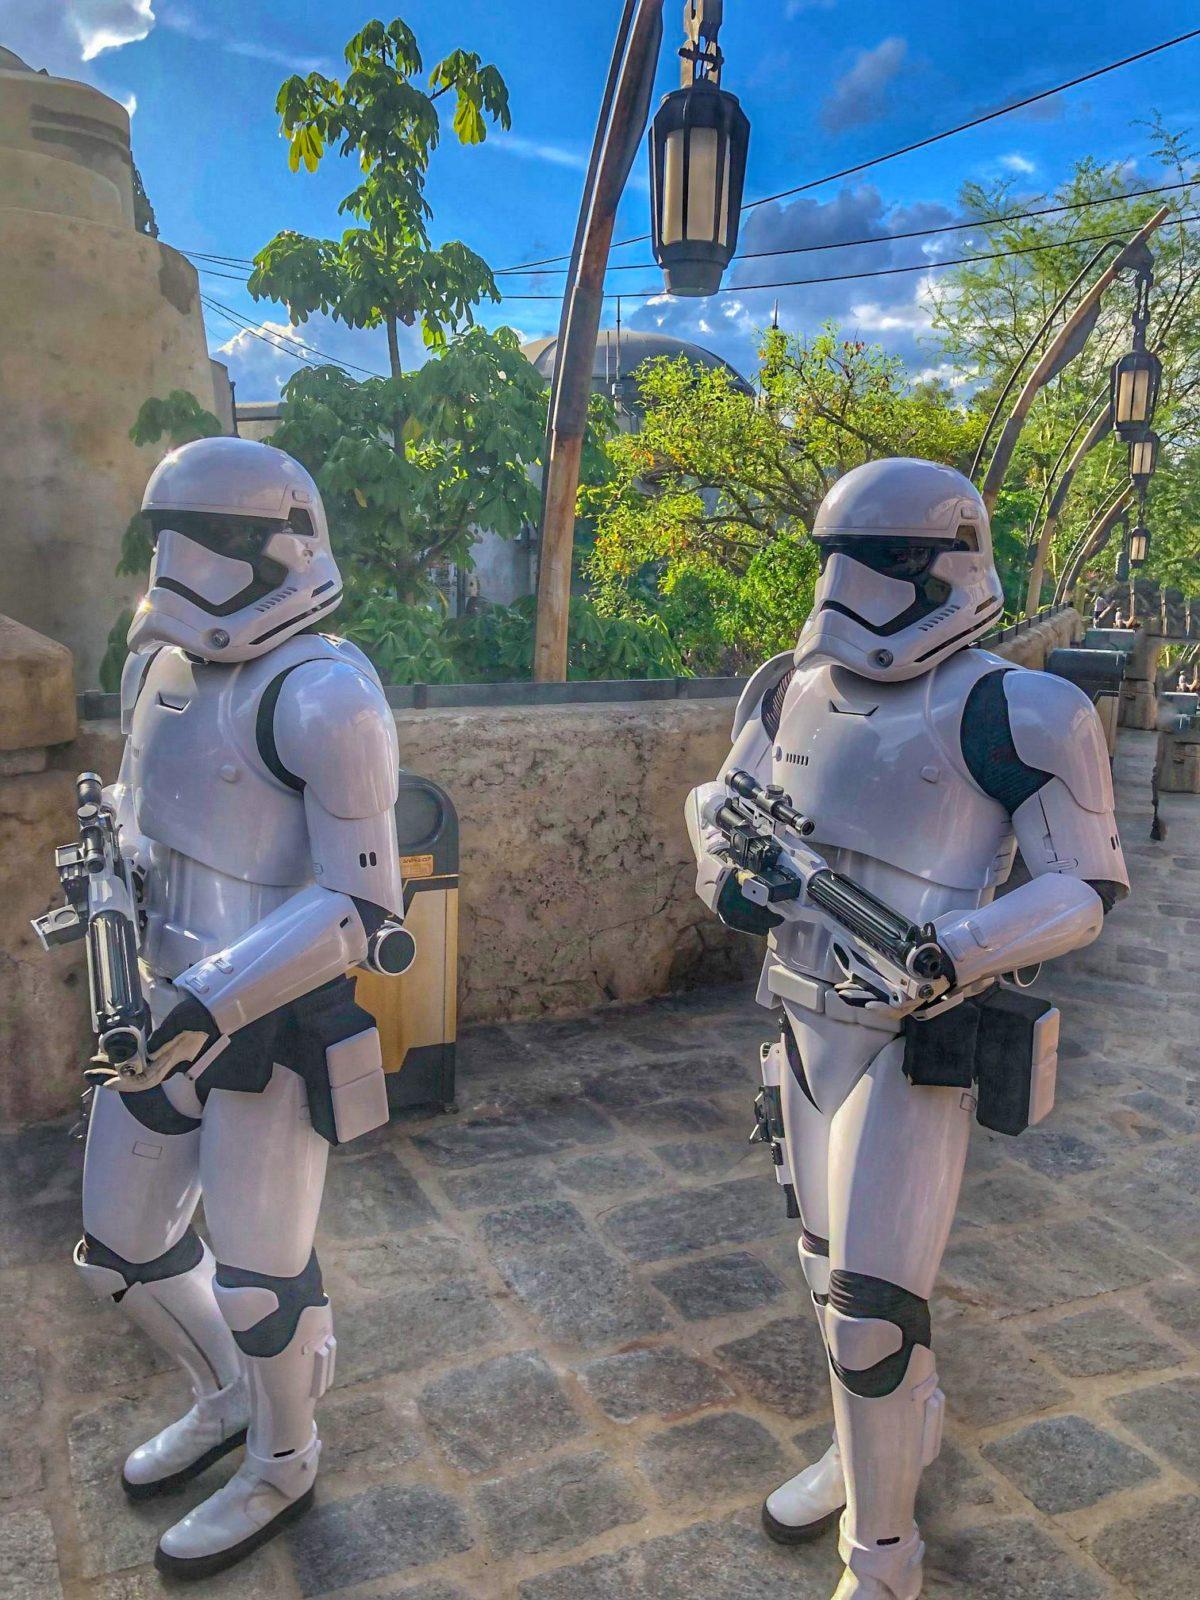 Disney's Galaxy's Edge stormtroopers